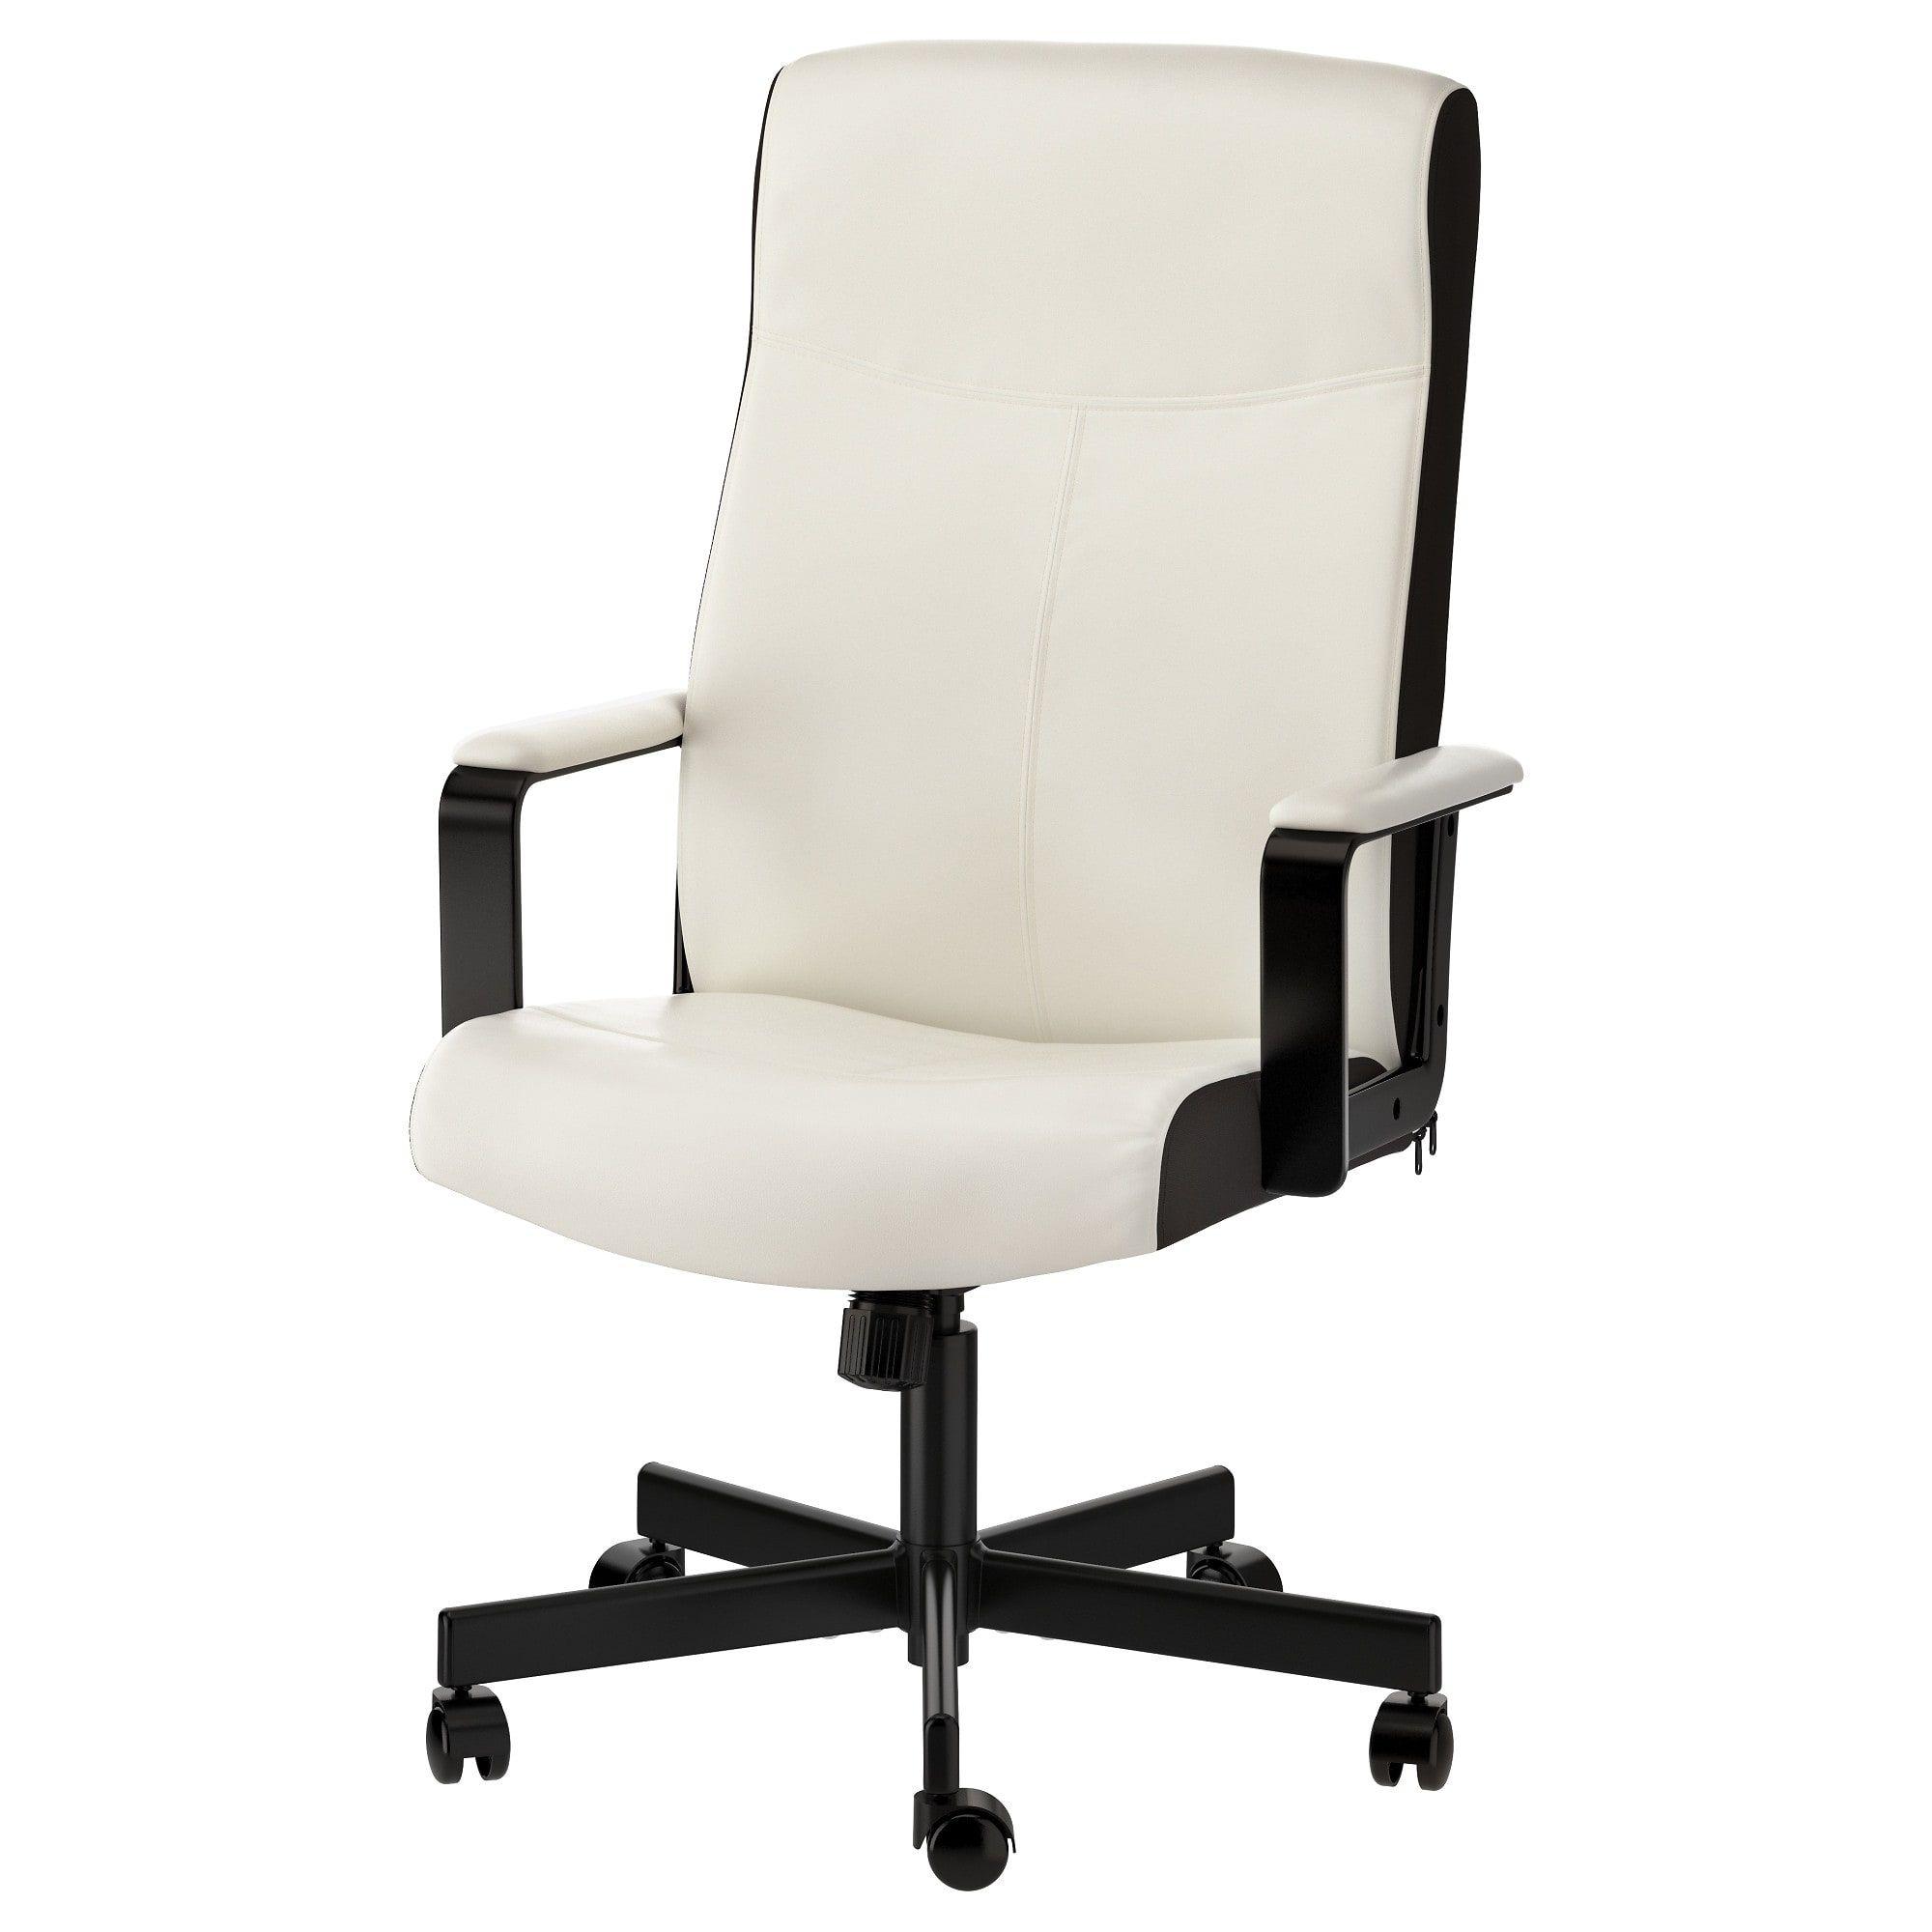 Millberget Swivel Chair Kimstad White Ikea Chaises Pivotantes Fauteuil Pivotant Chaise Bureau Ikea